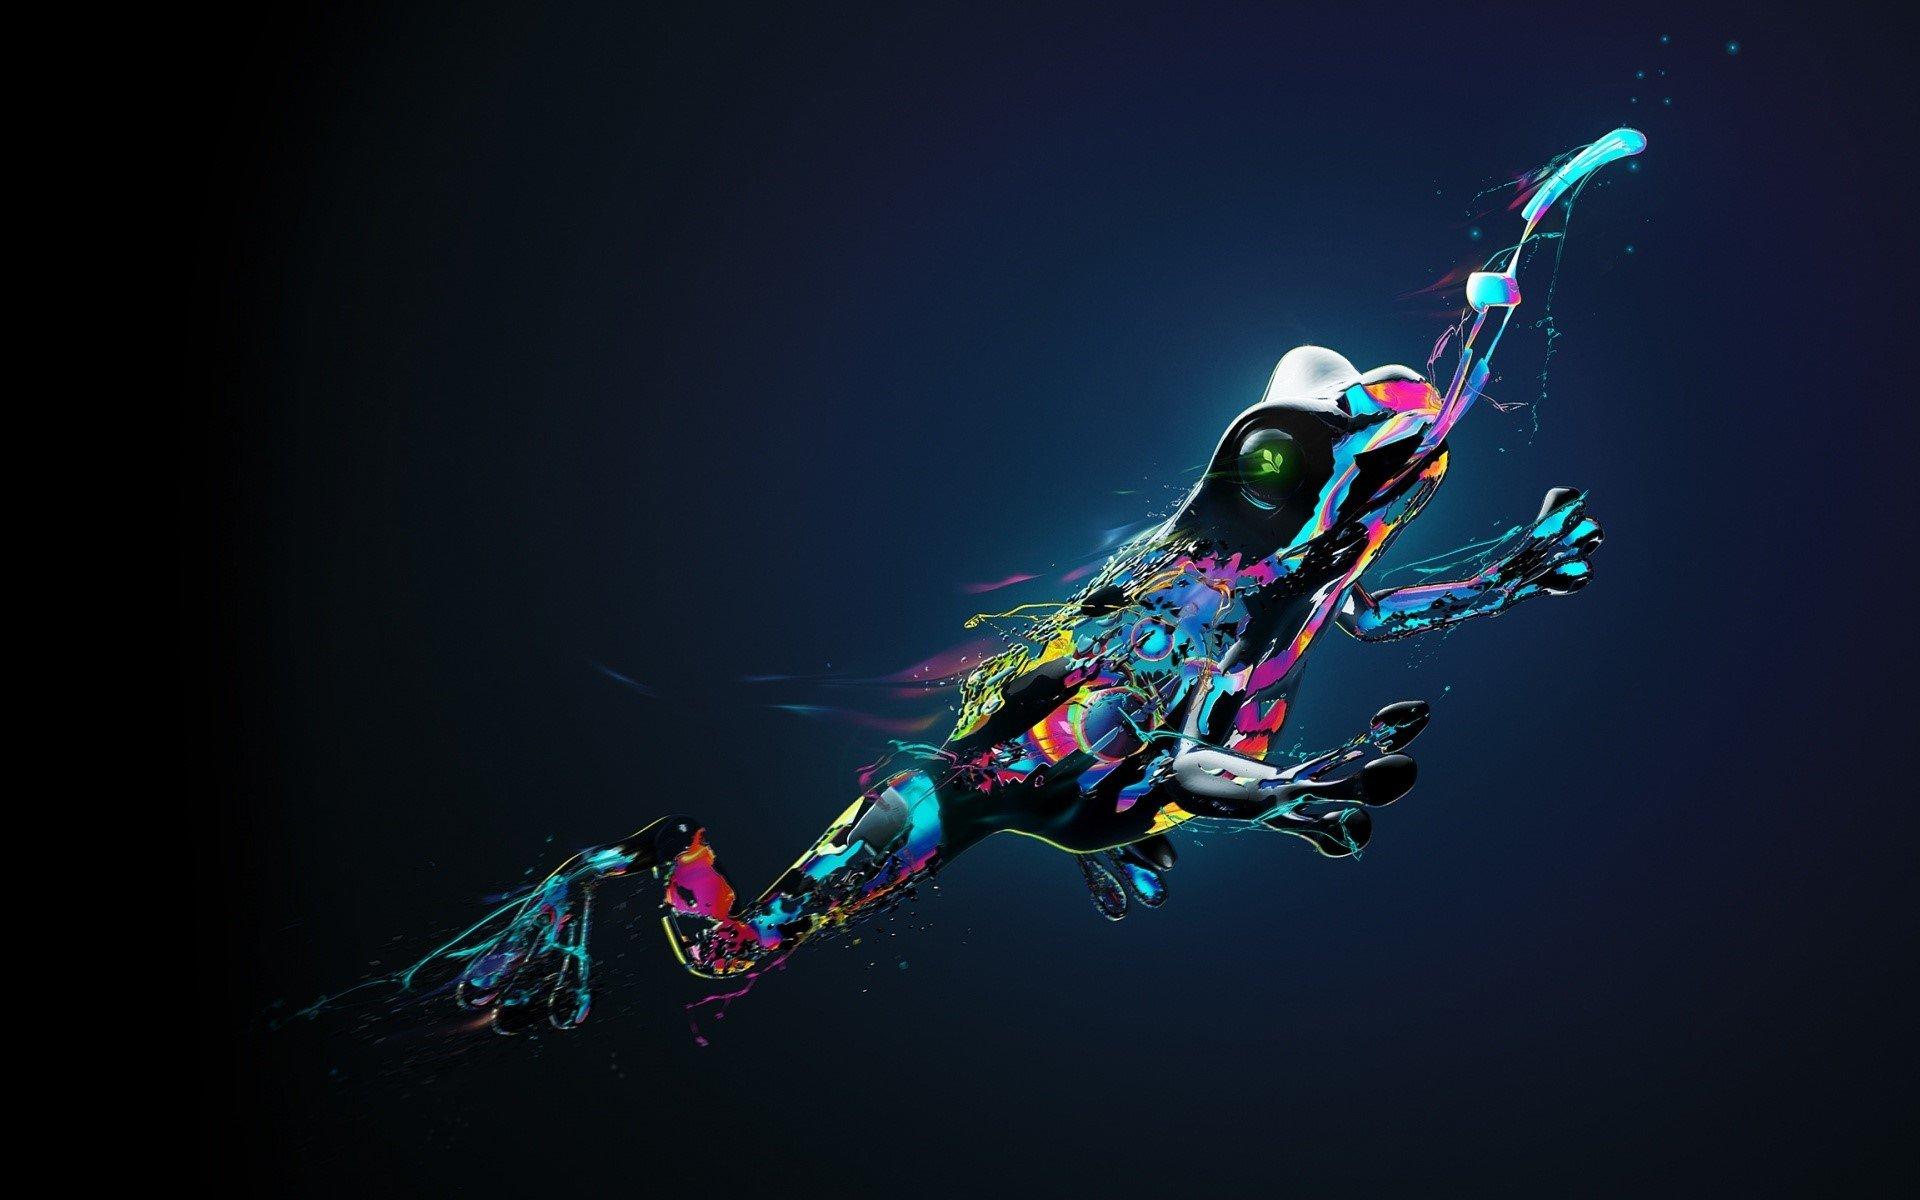 Fondos de pantalla Rana hecha de colores